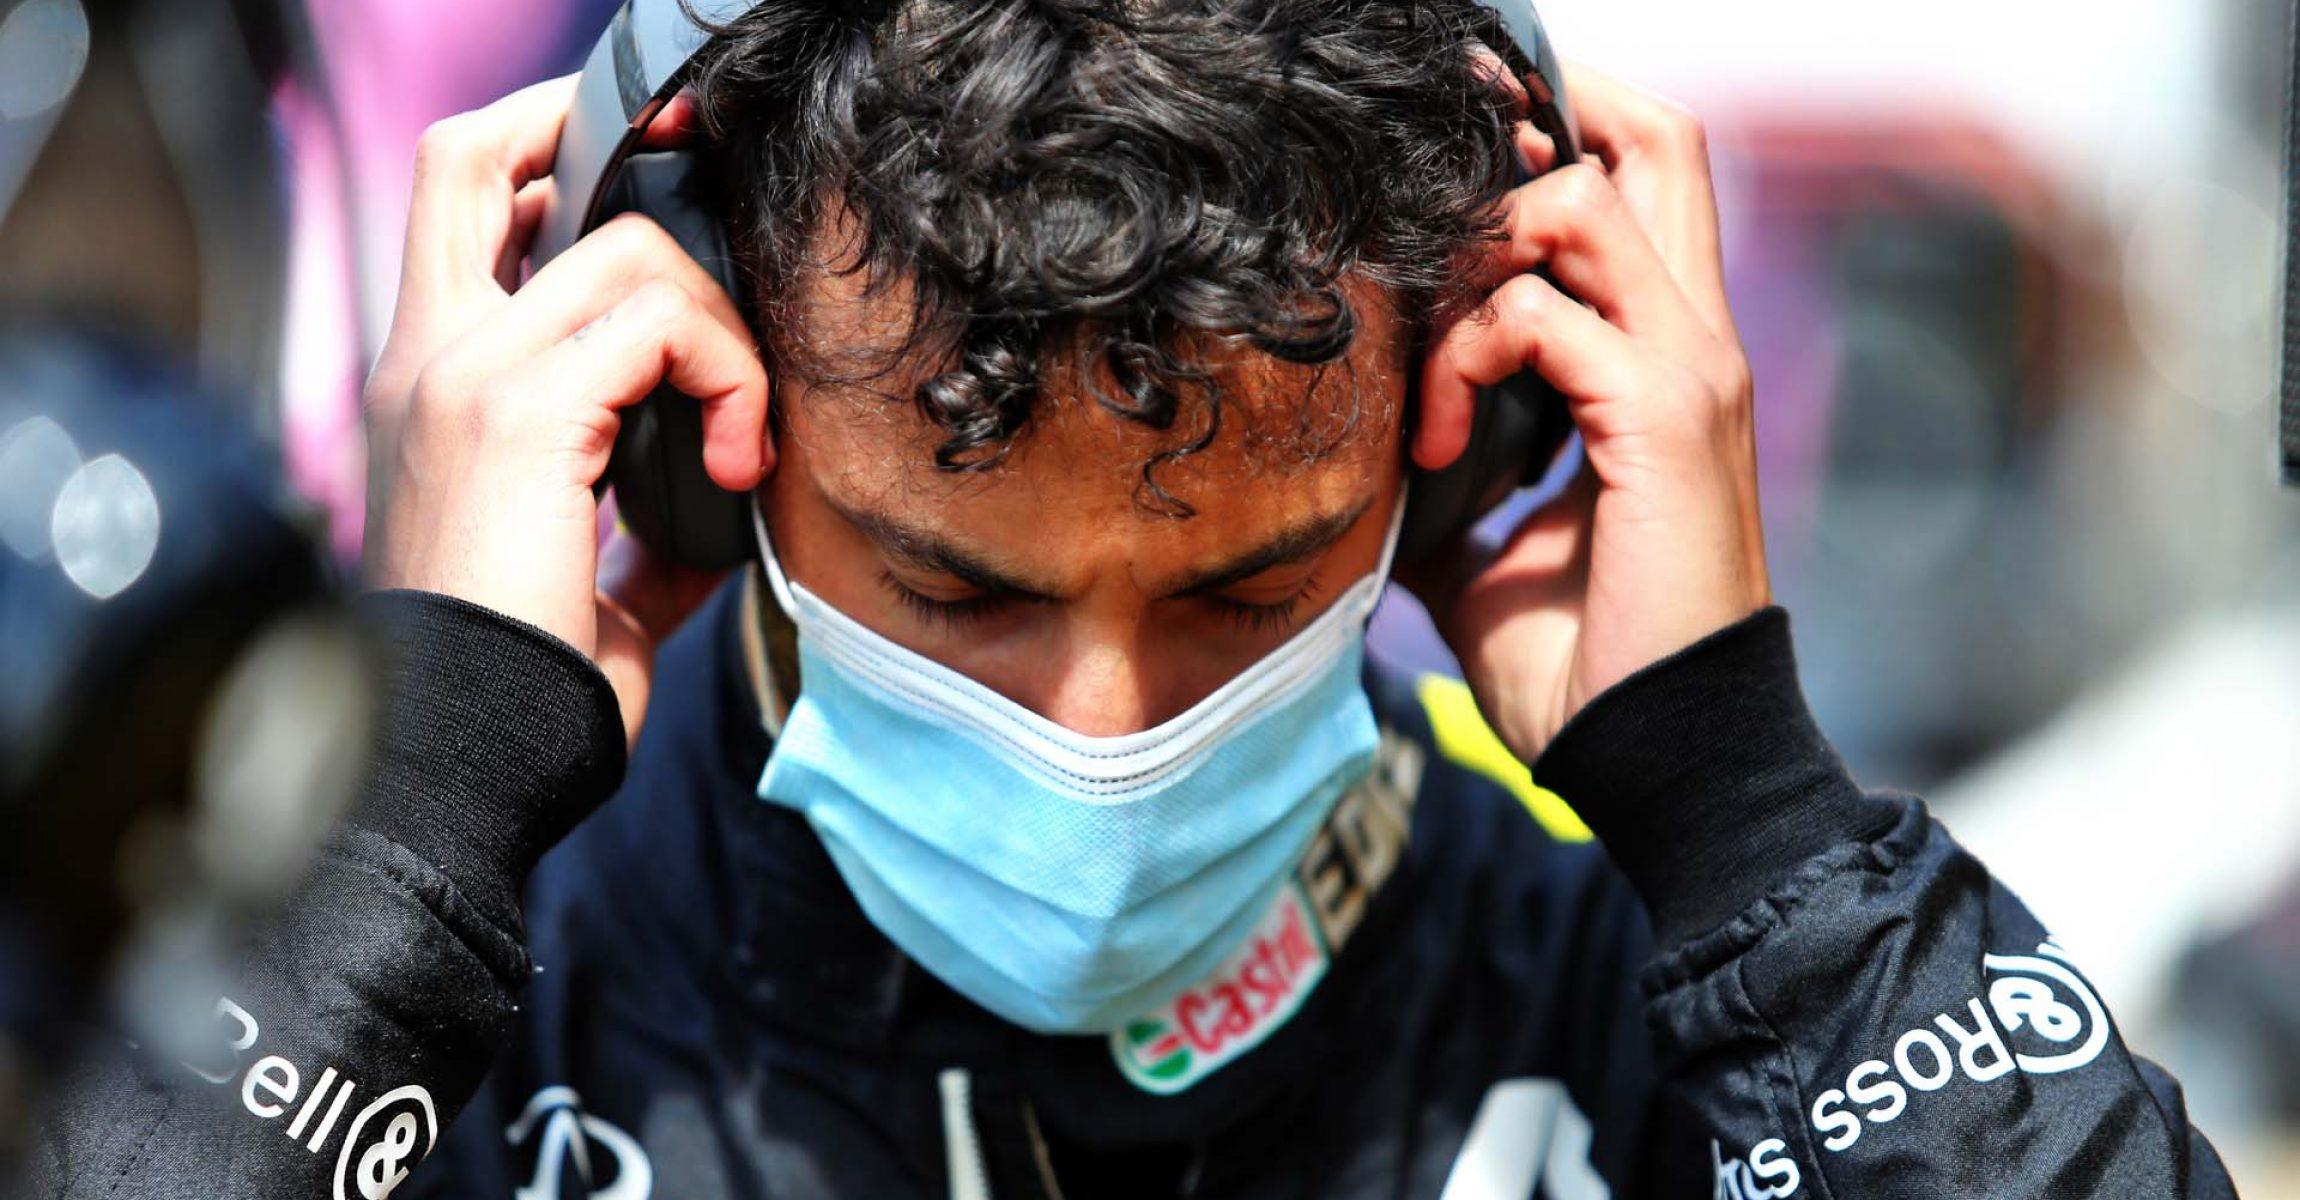 Daniel Ricciardo (AUS) Renault F1 Team on the grid. British Grand Prix, Sunday 2nd August 2020. Silverstone, England.